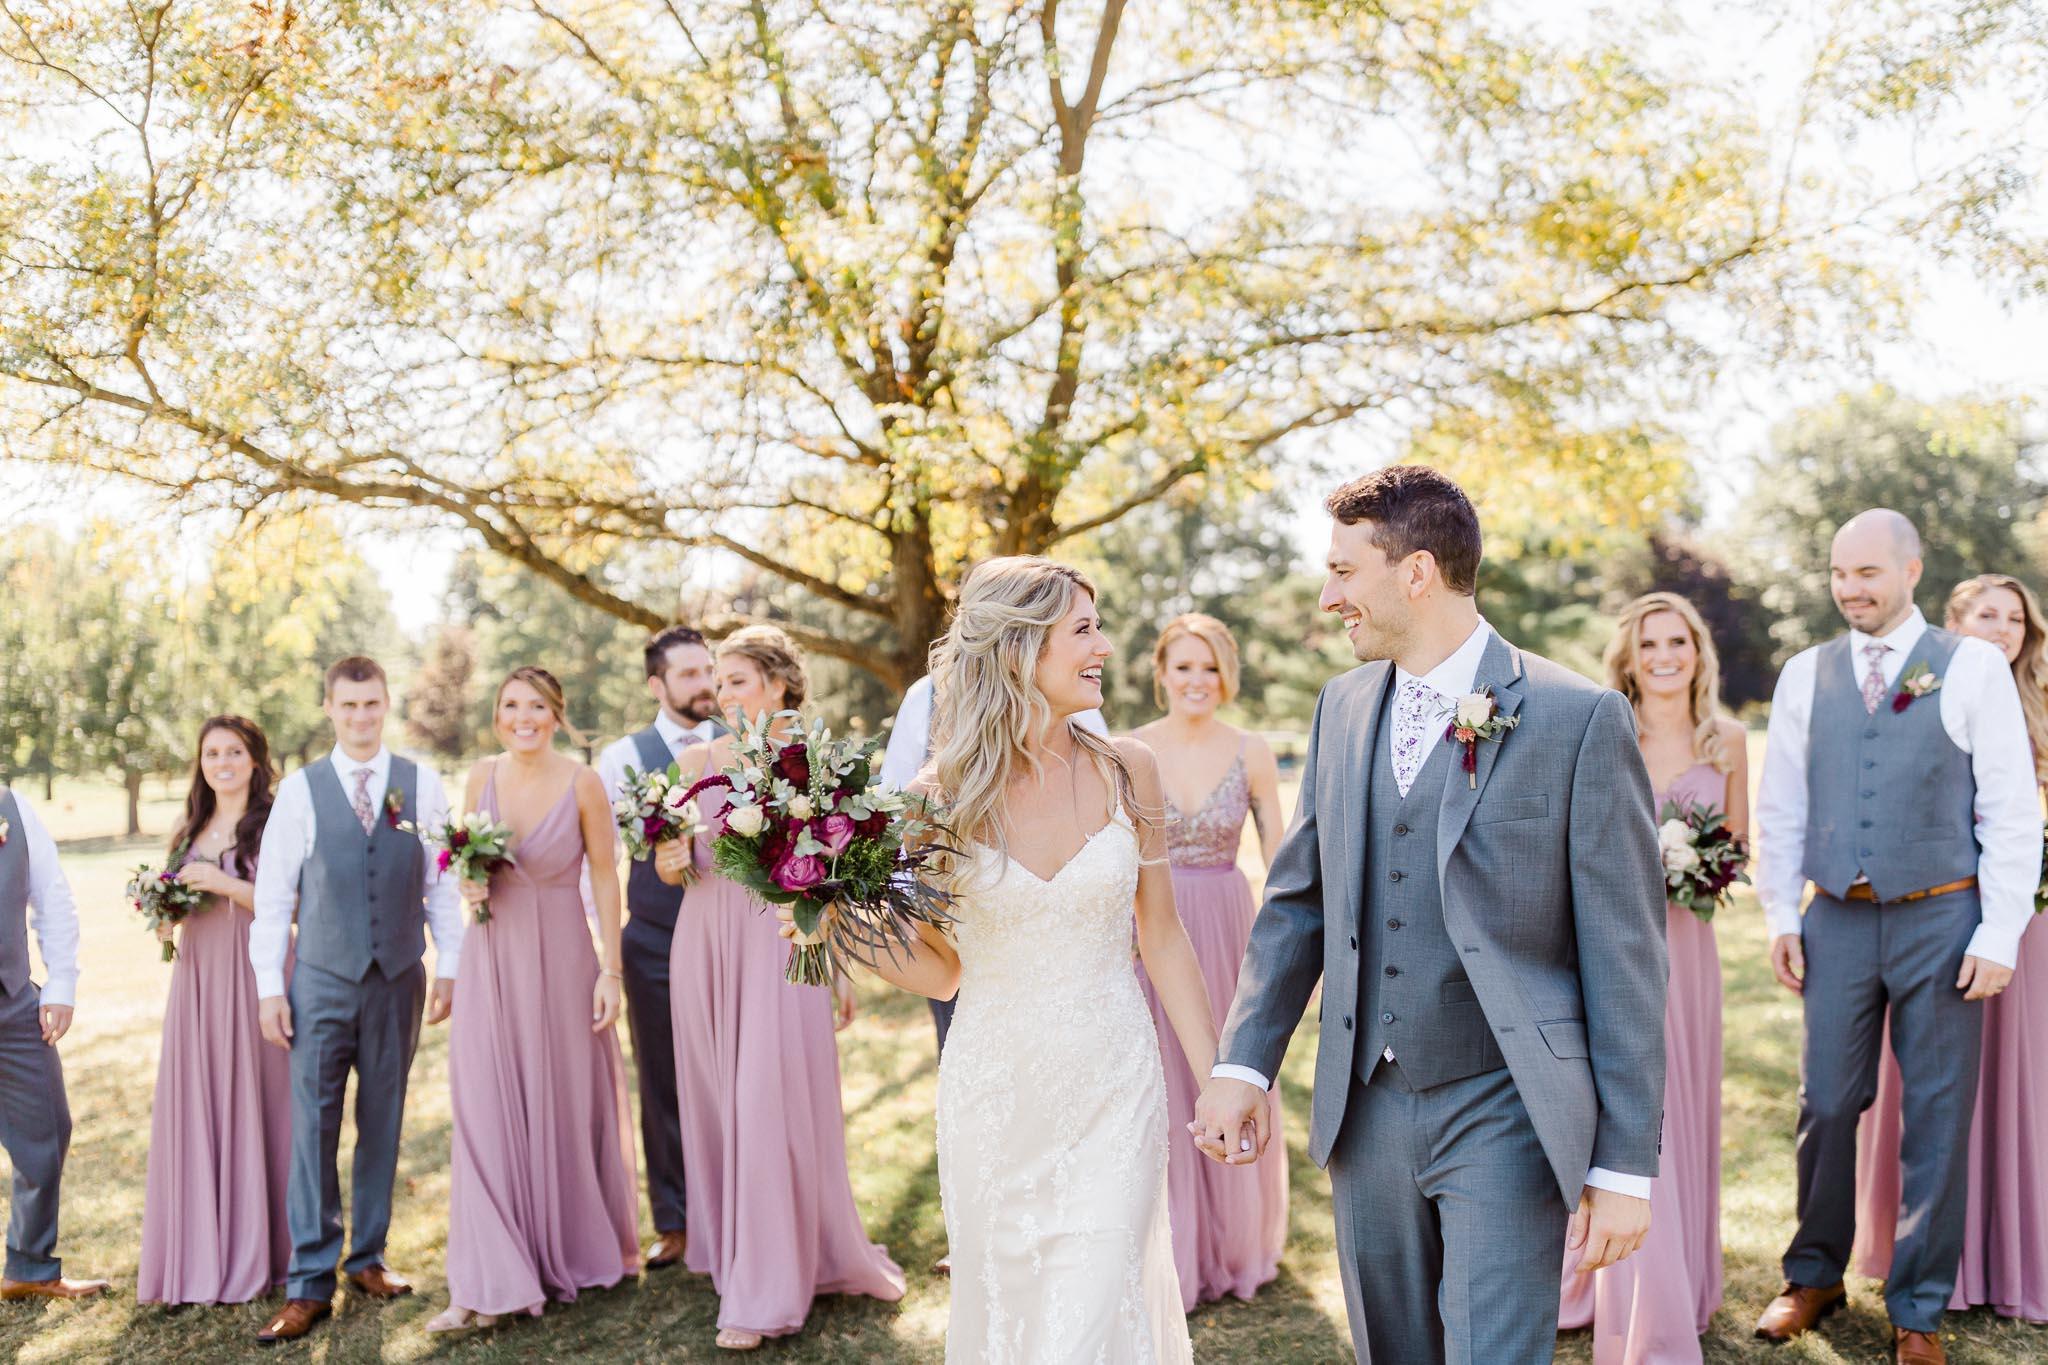 Frosty-Valley-September-Wedding-7456.jpg